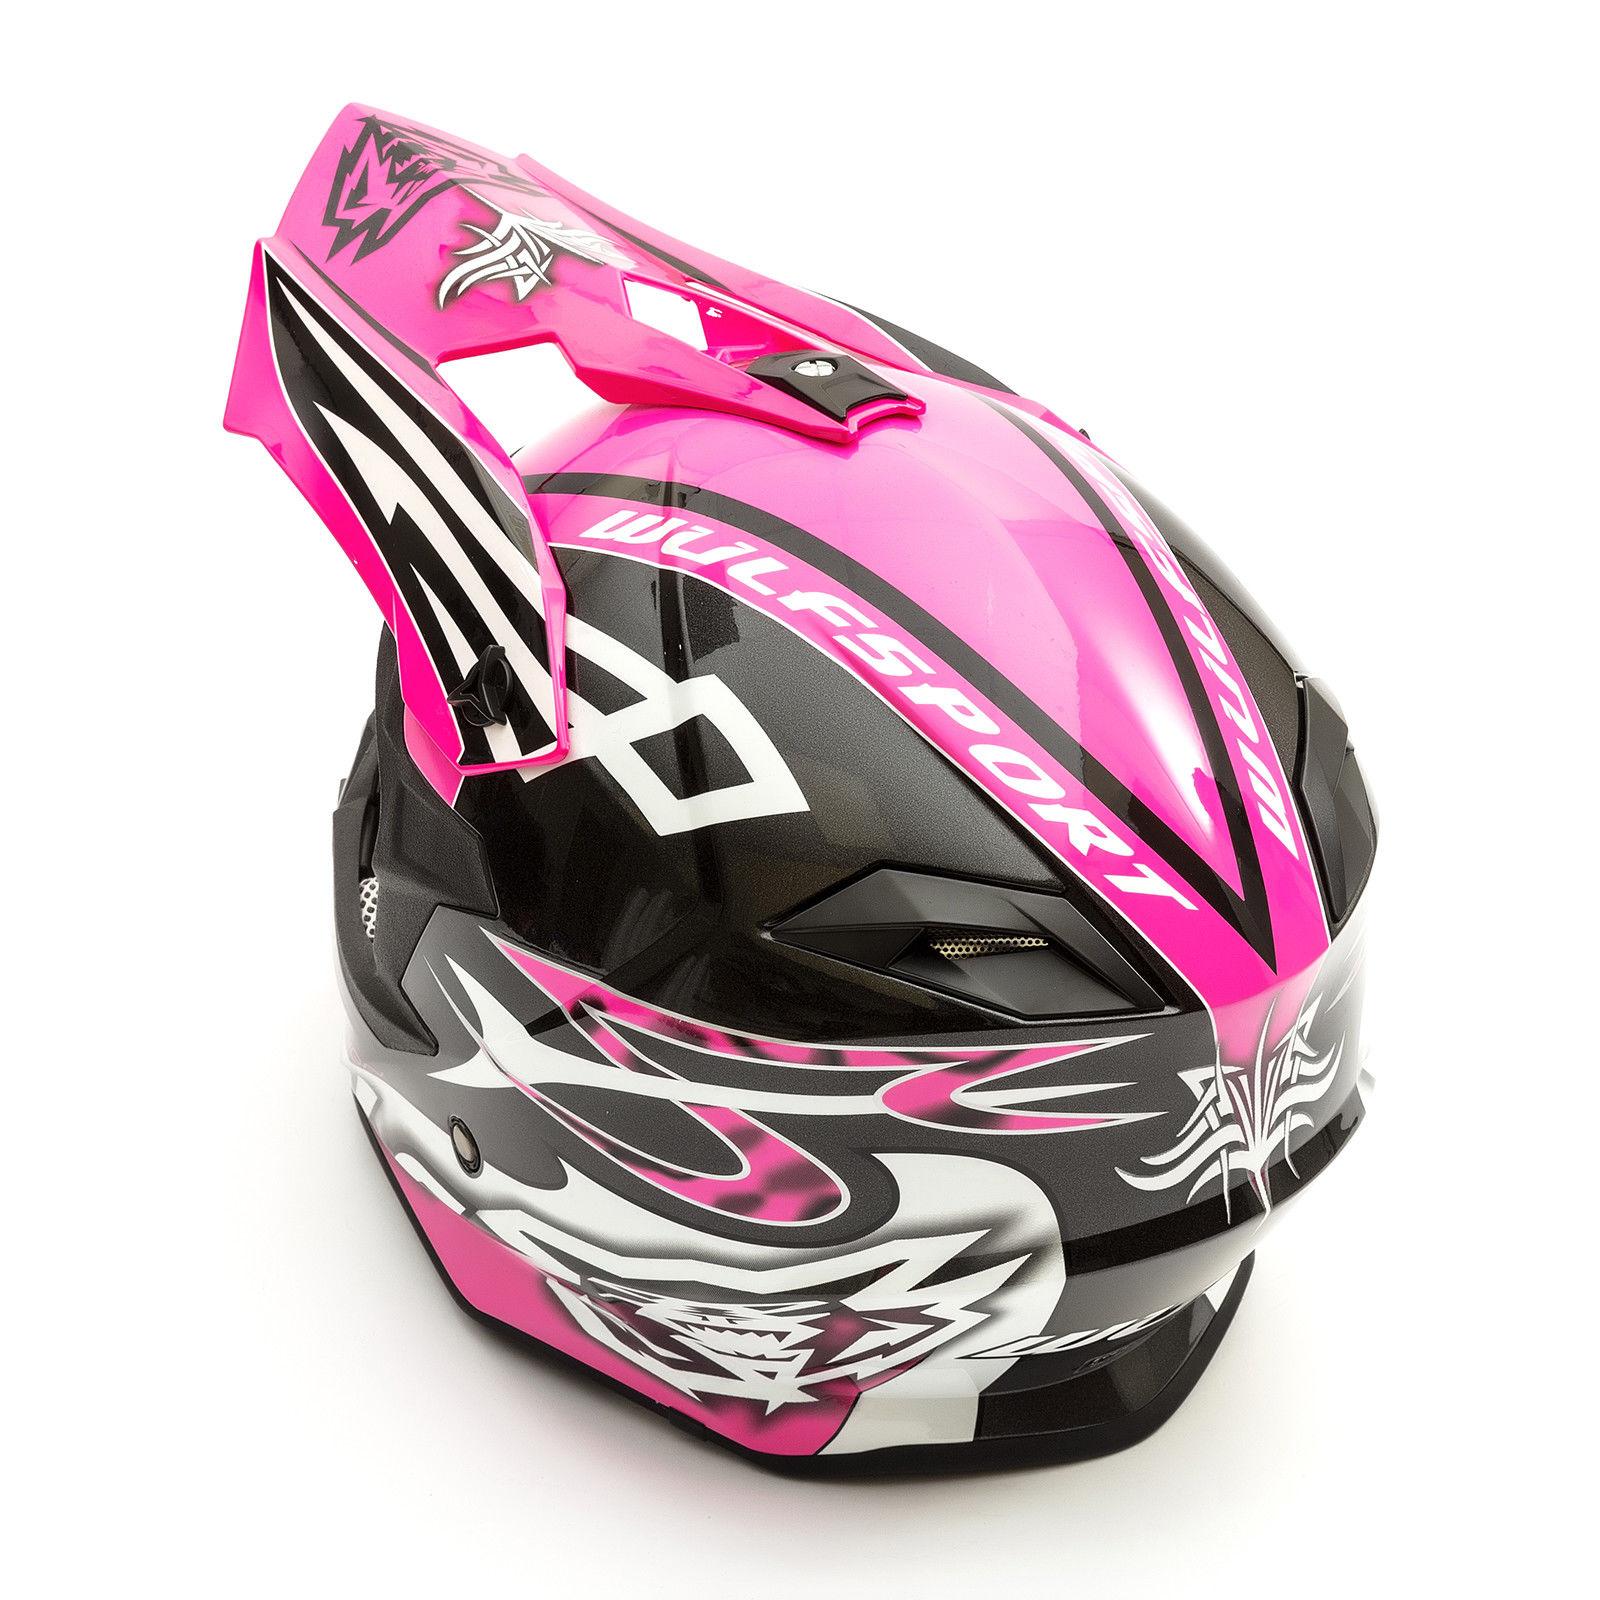 Wulfsport-Adult-Sceptre-Helmets-Motocross-Pitbike-Motorbike-Off-Road-Racing-ATV thumbnail 41